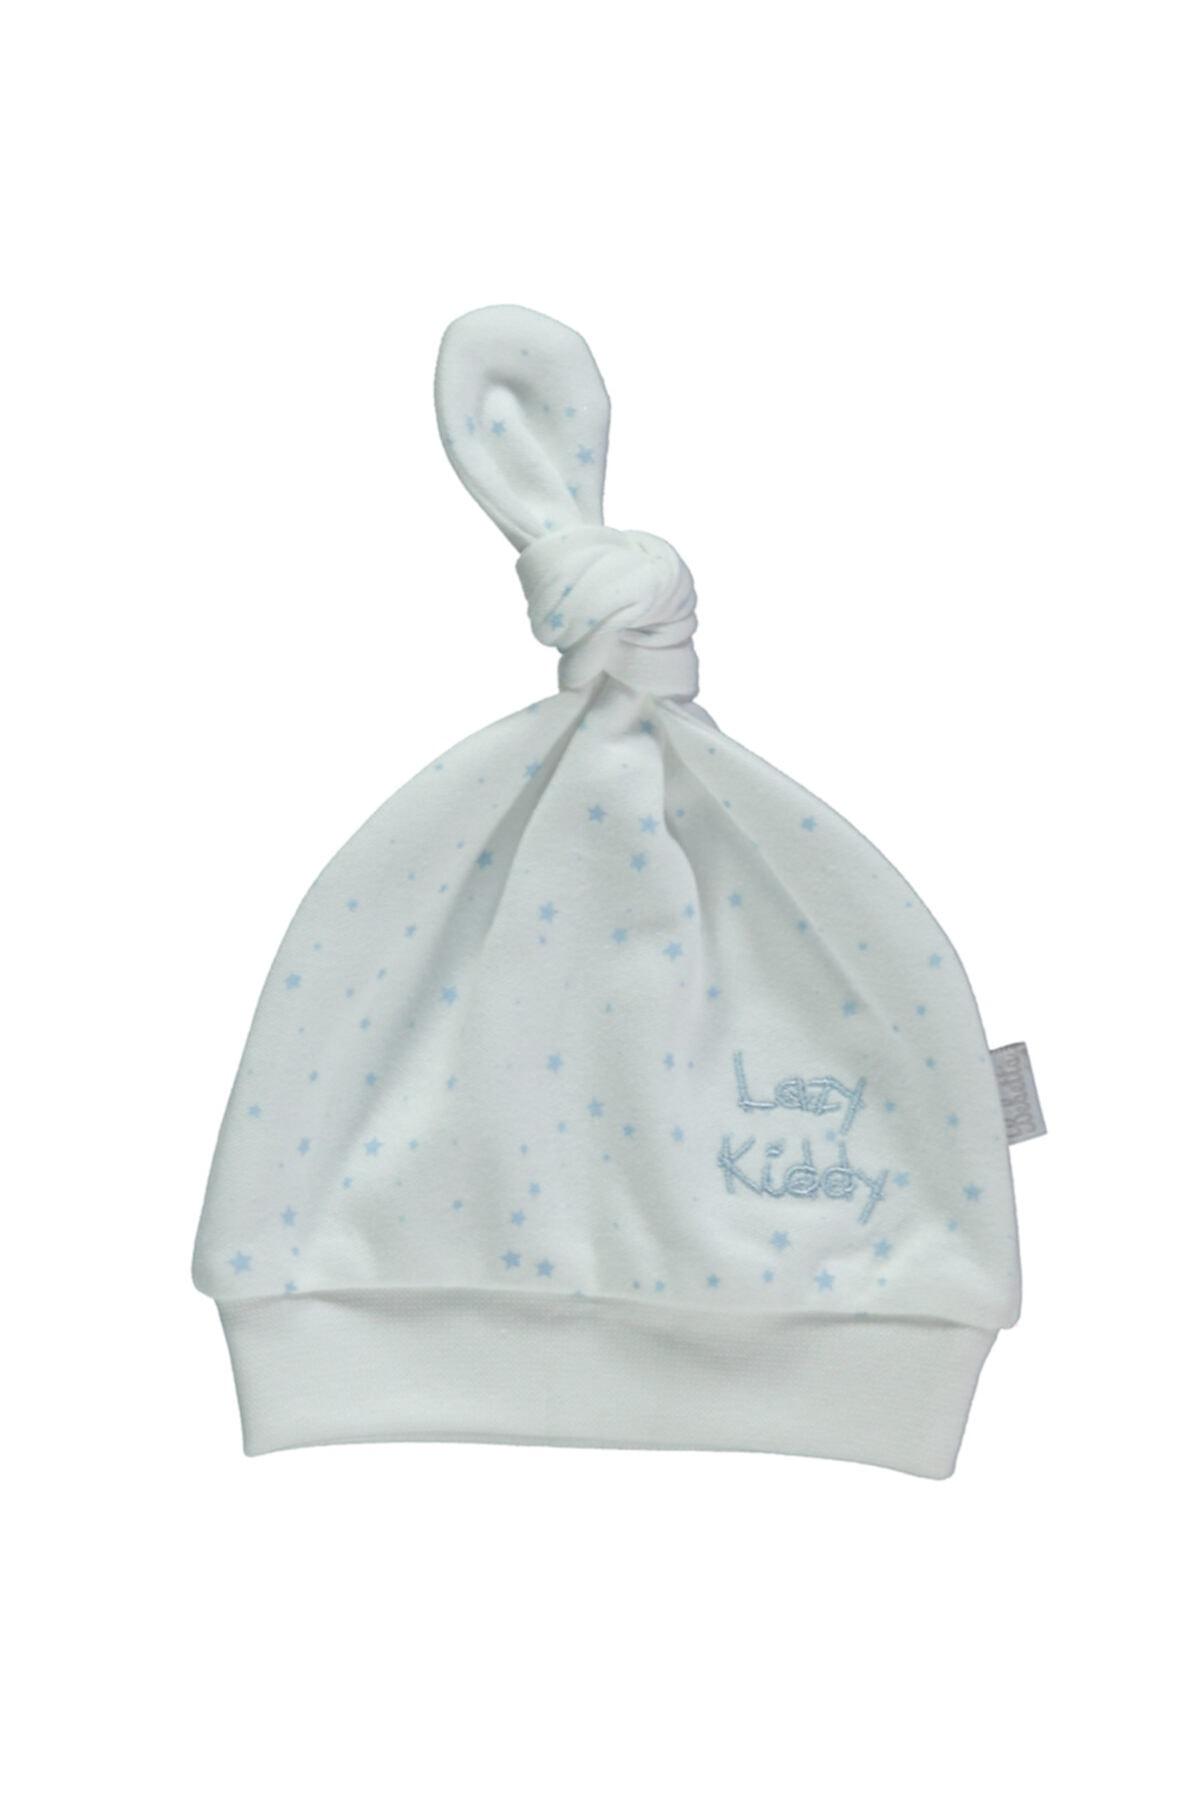 Bebetto Interlok Şapka 2li (lazy Kıddy) (t2069) 2